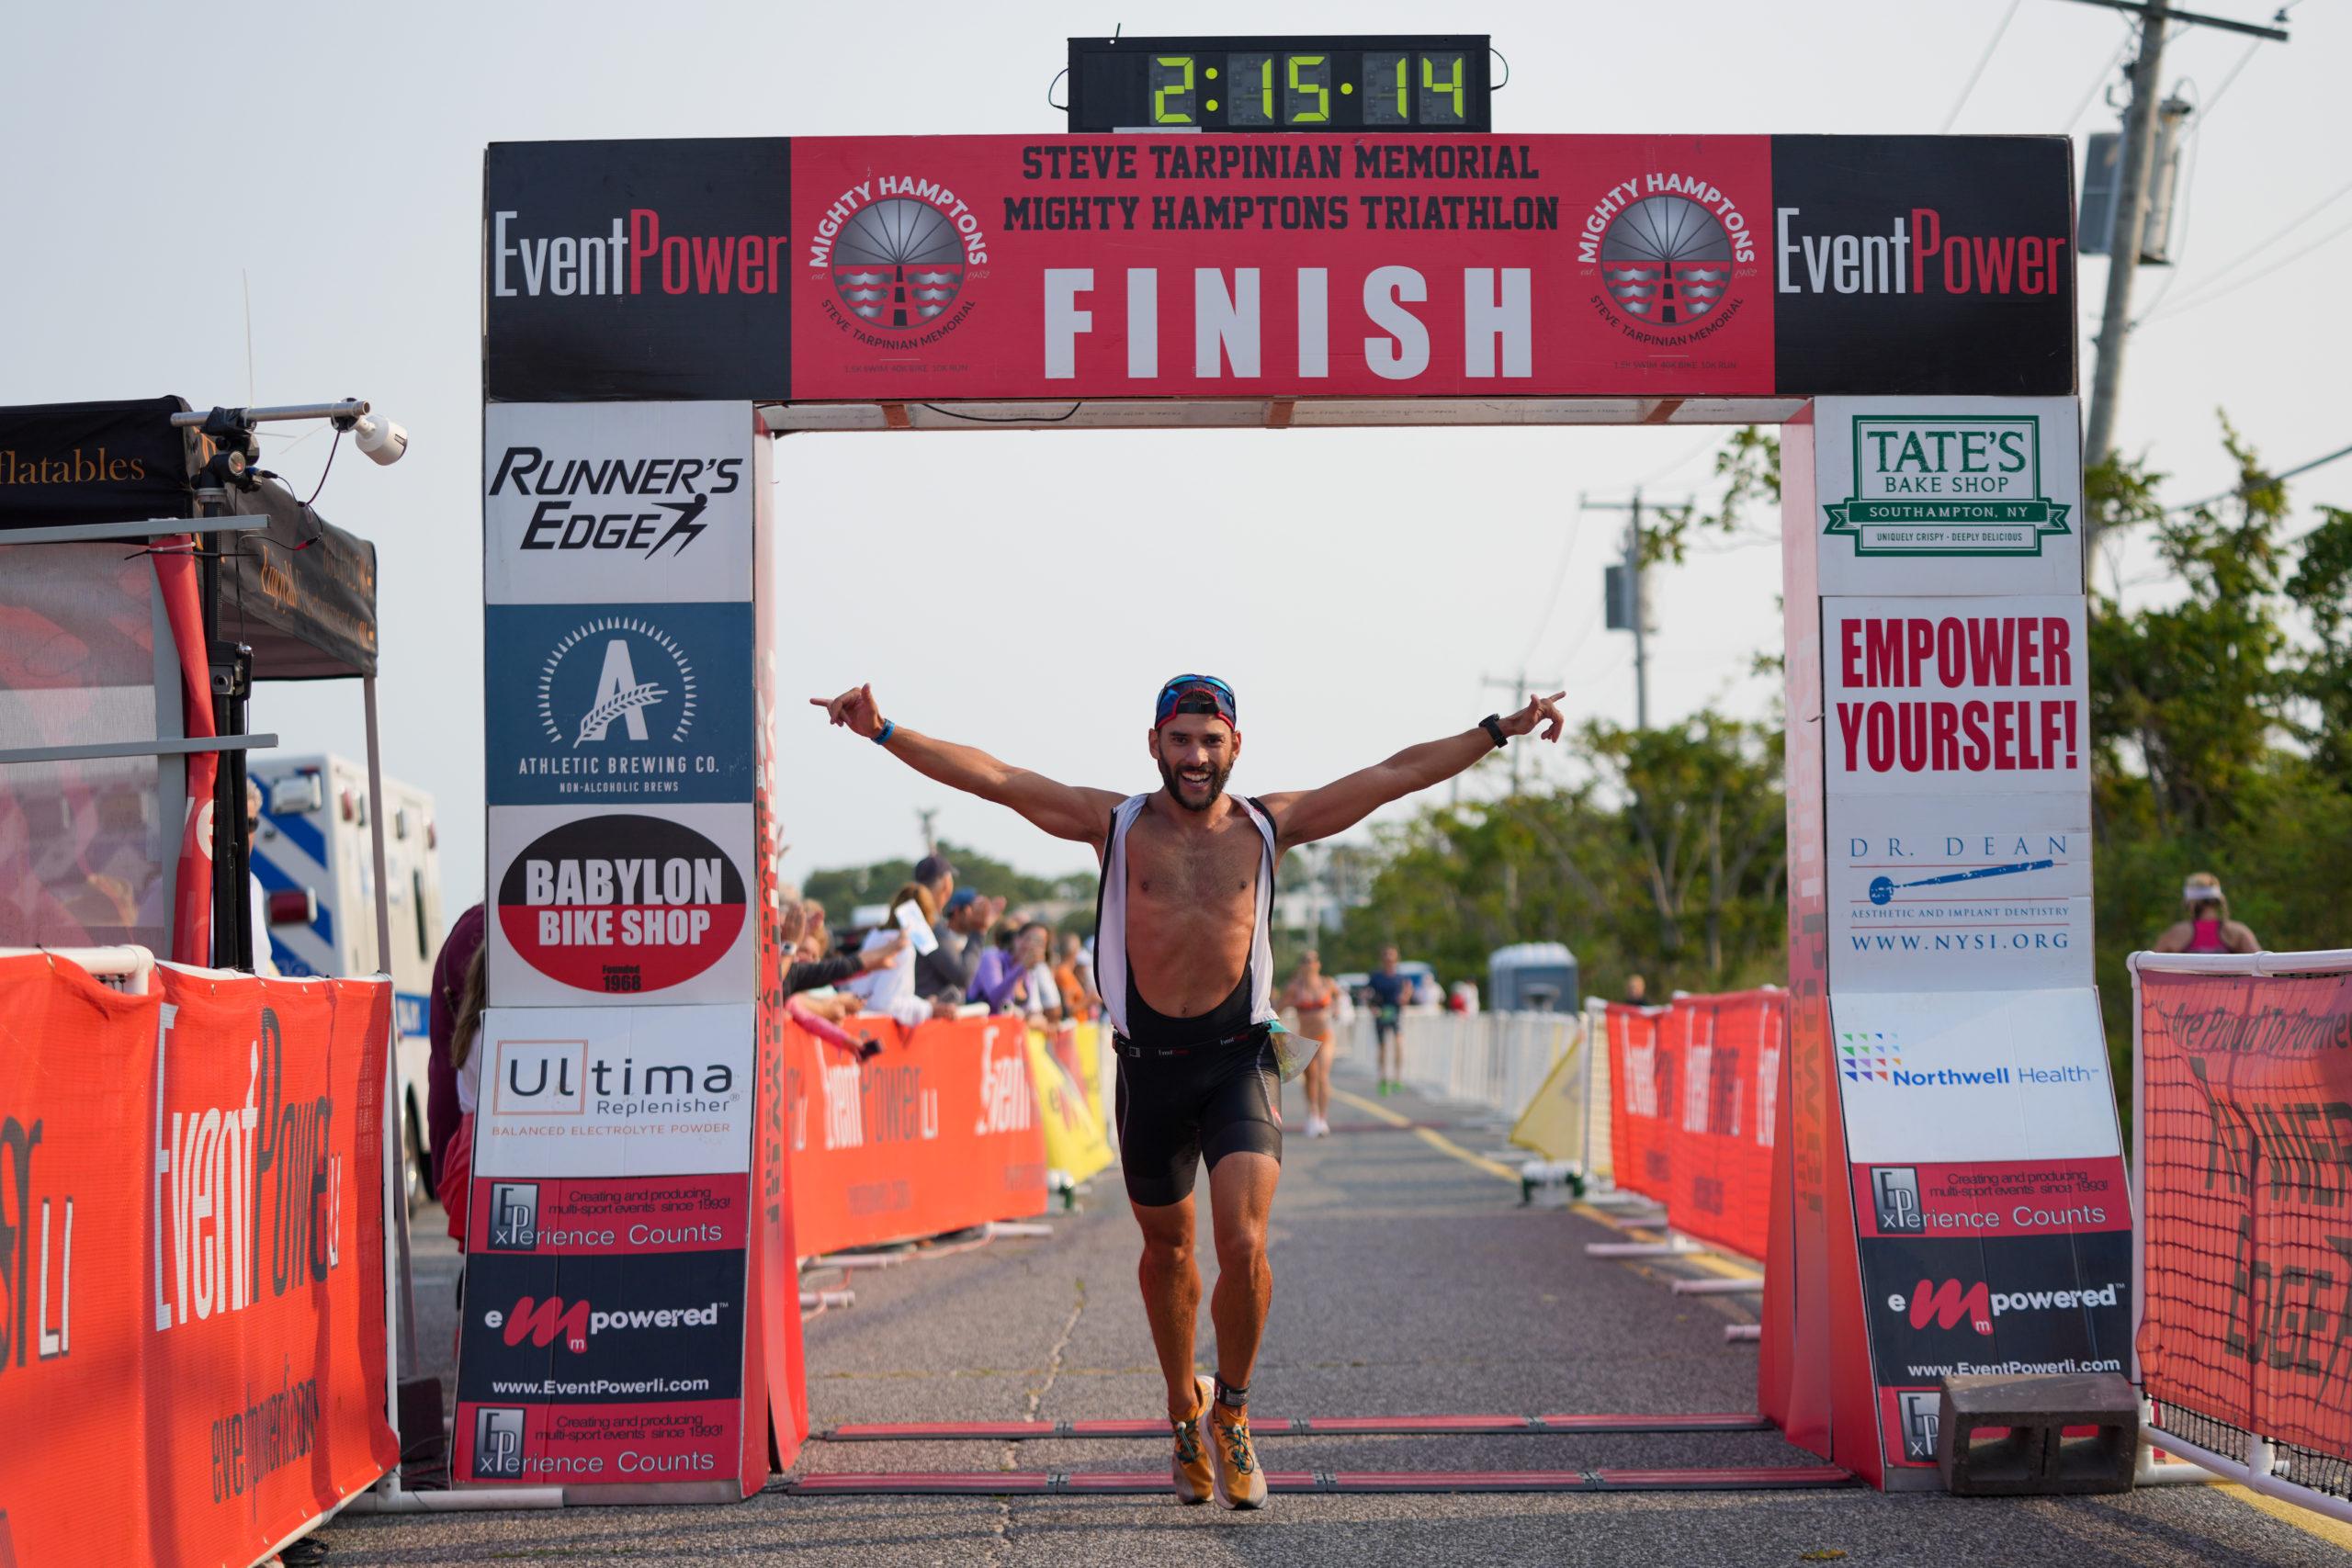 An athlete crosses the finish line of the Steve Tarpinian Memorial Mighty Hamptons Triathlon.